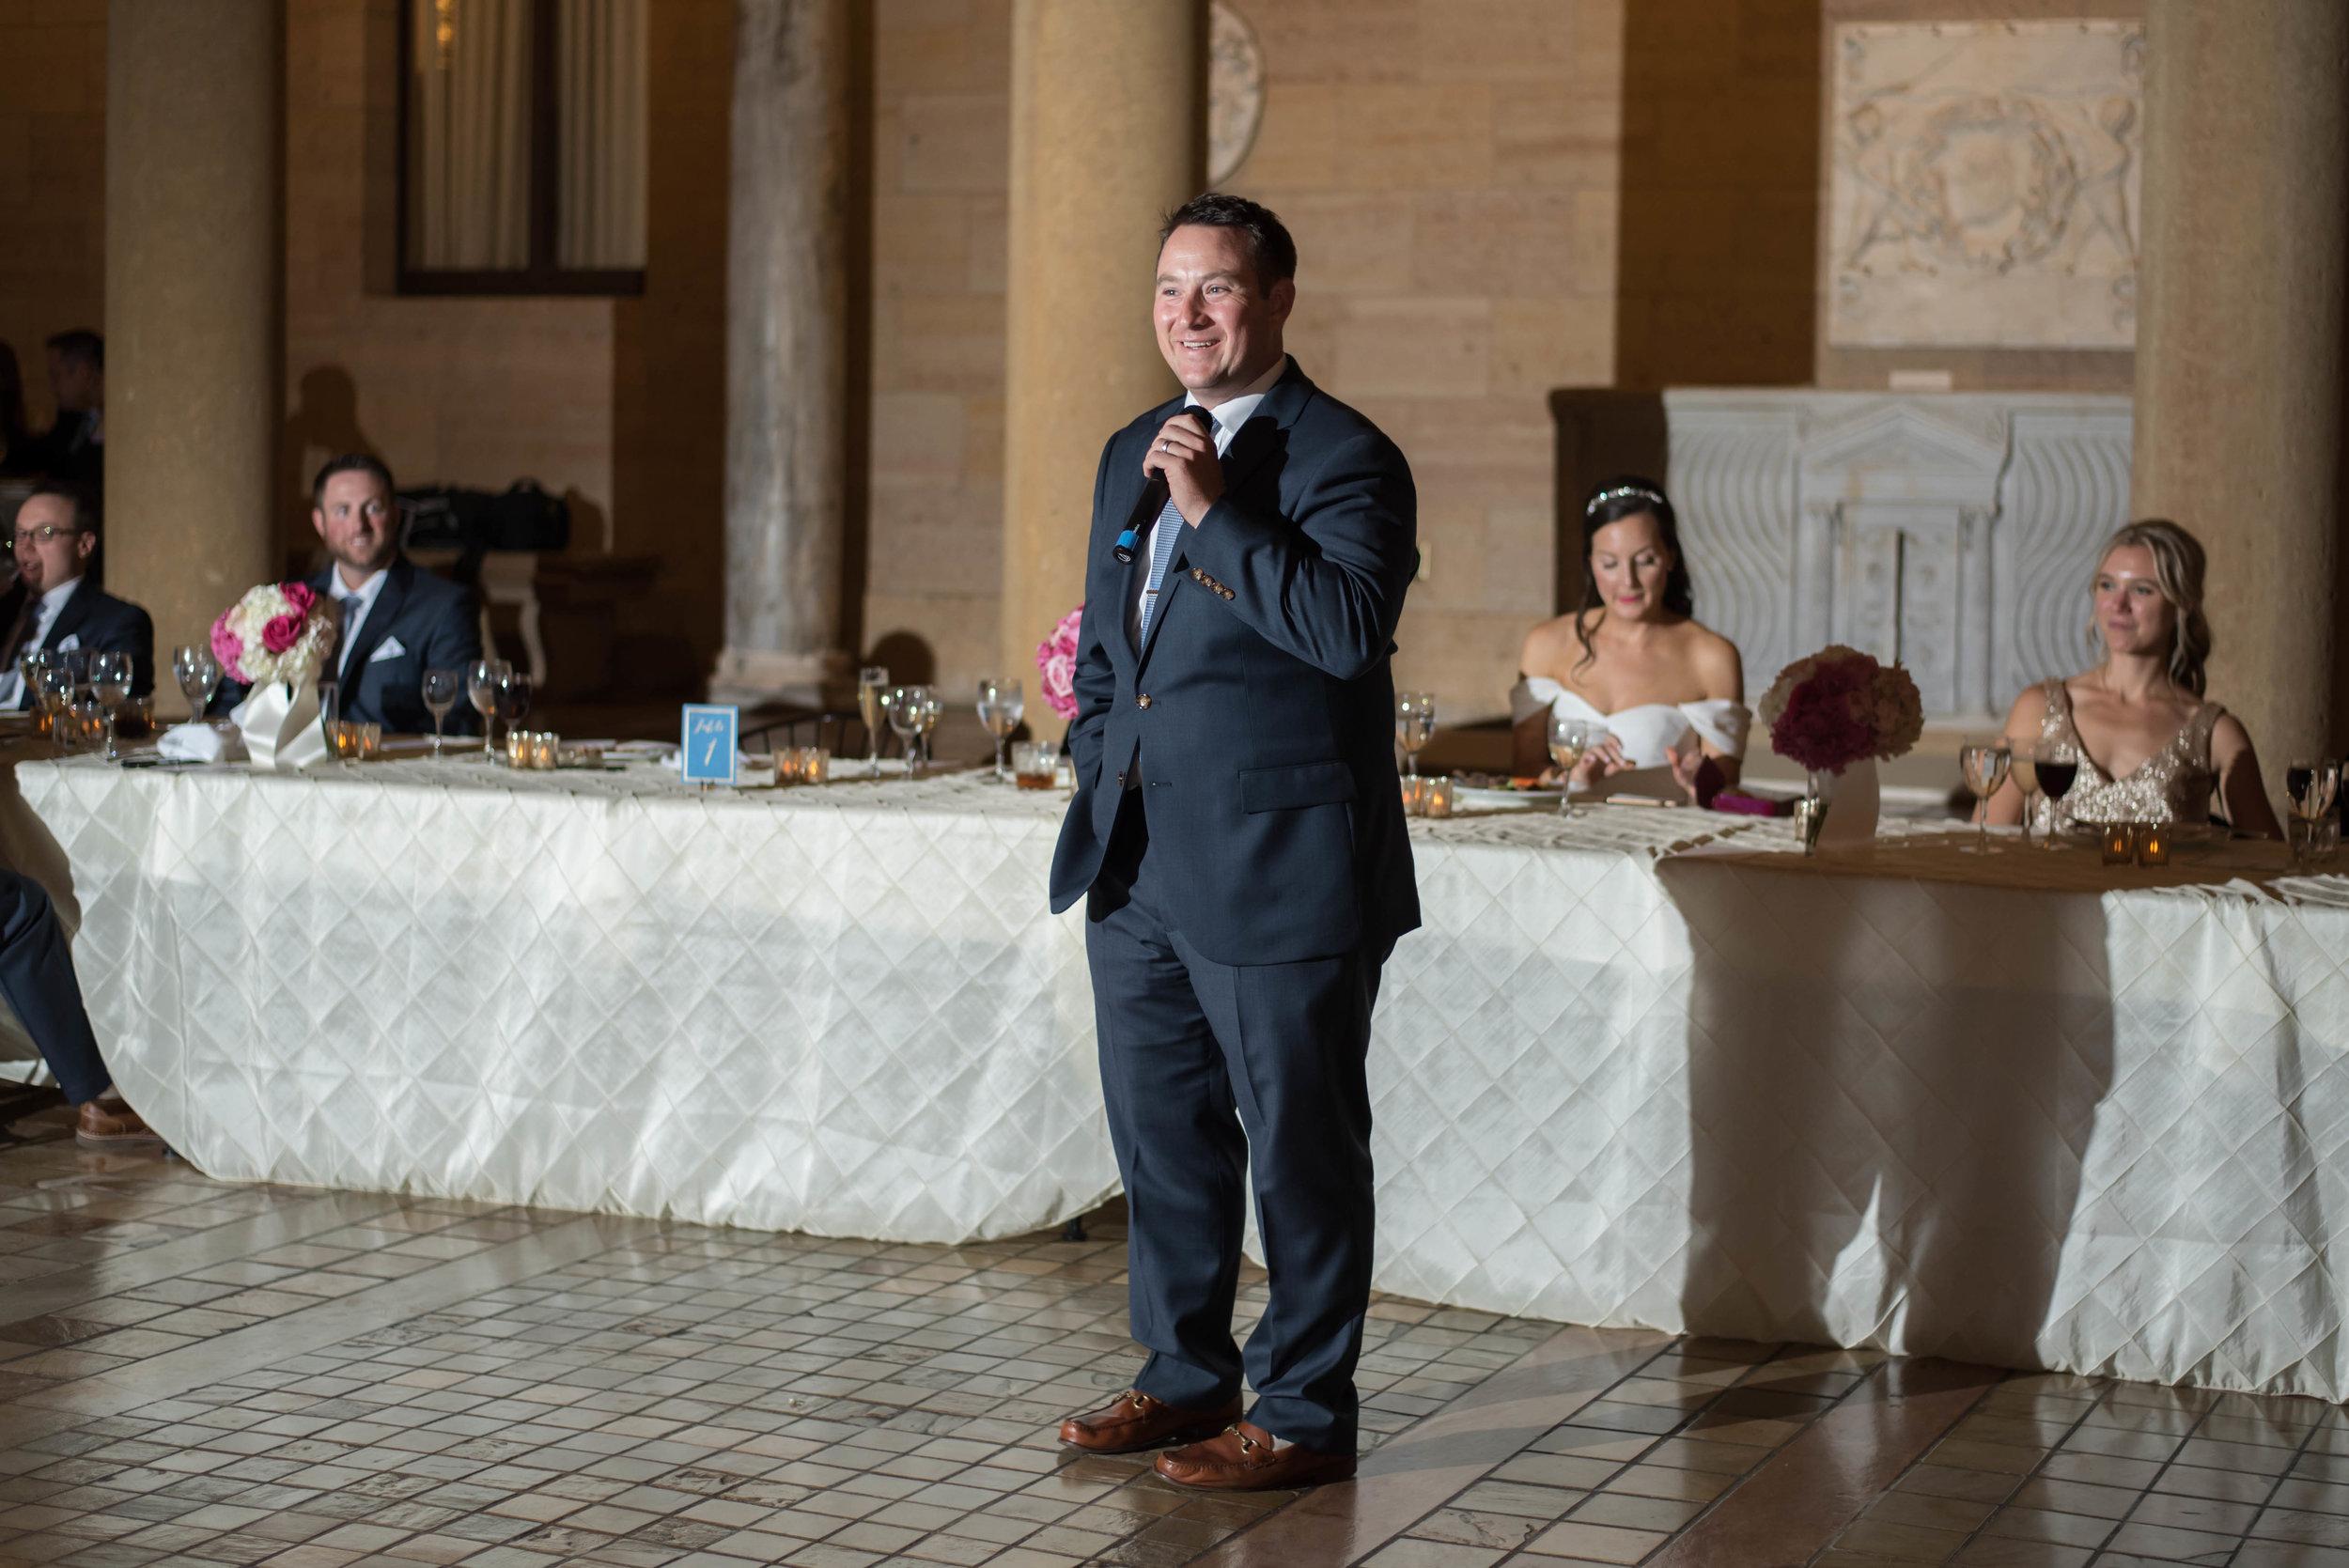 nelson-atkins-wedding-74.jpg